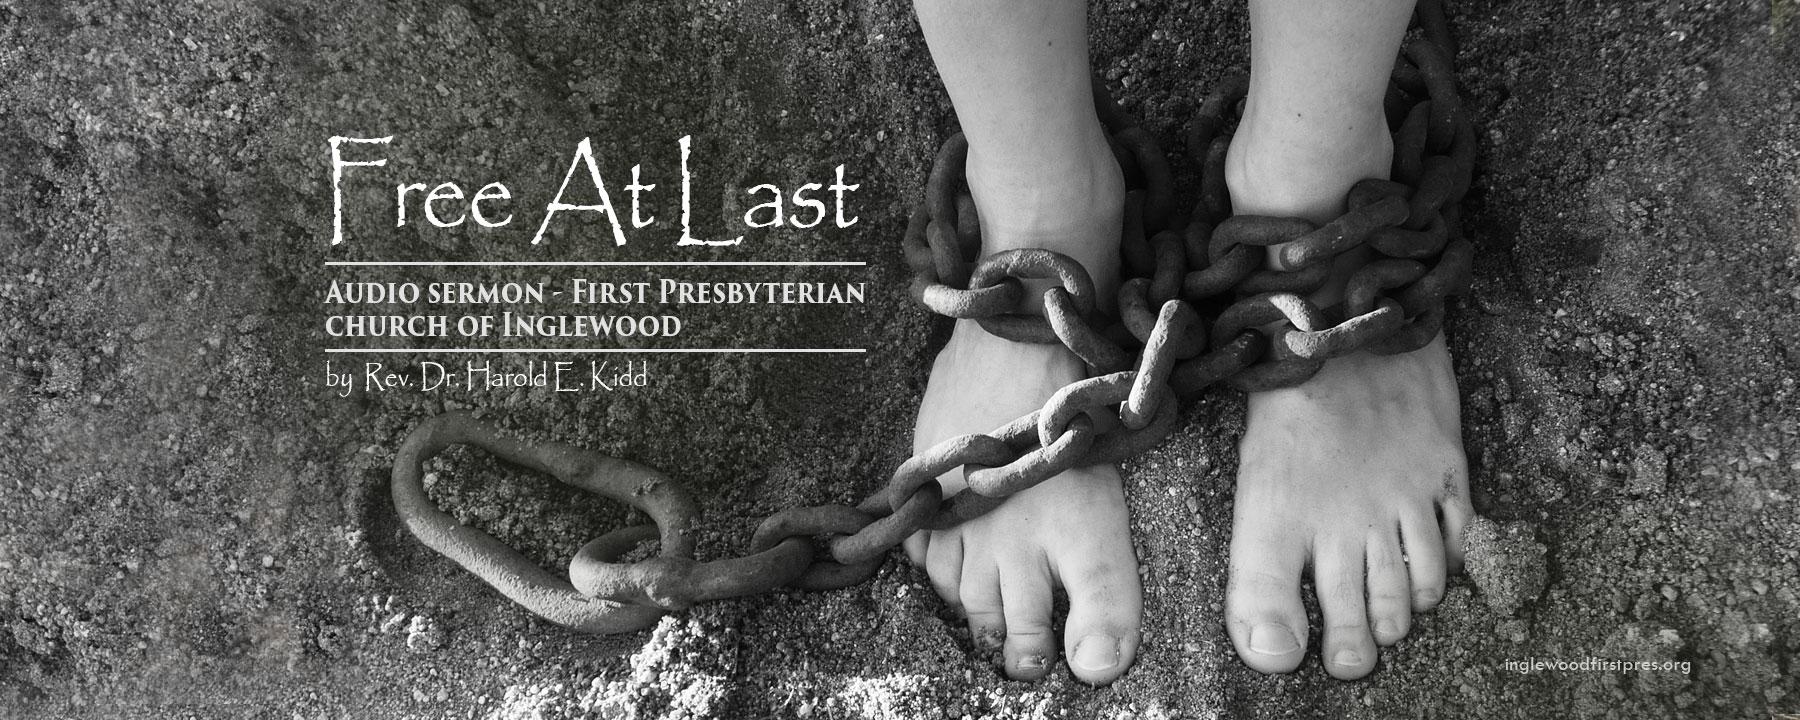 Online Sermon: Free at Last by Rev. Dr. Harold E. Kidd + Galations Series